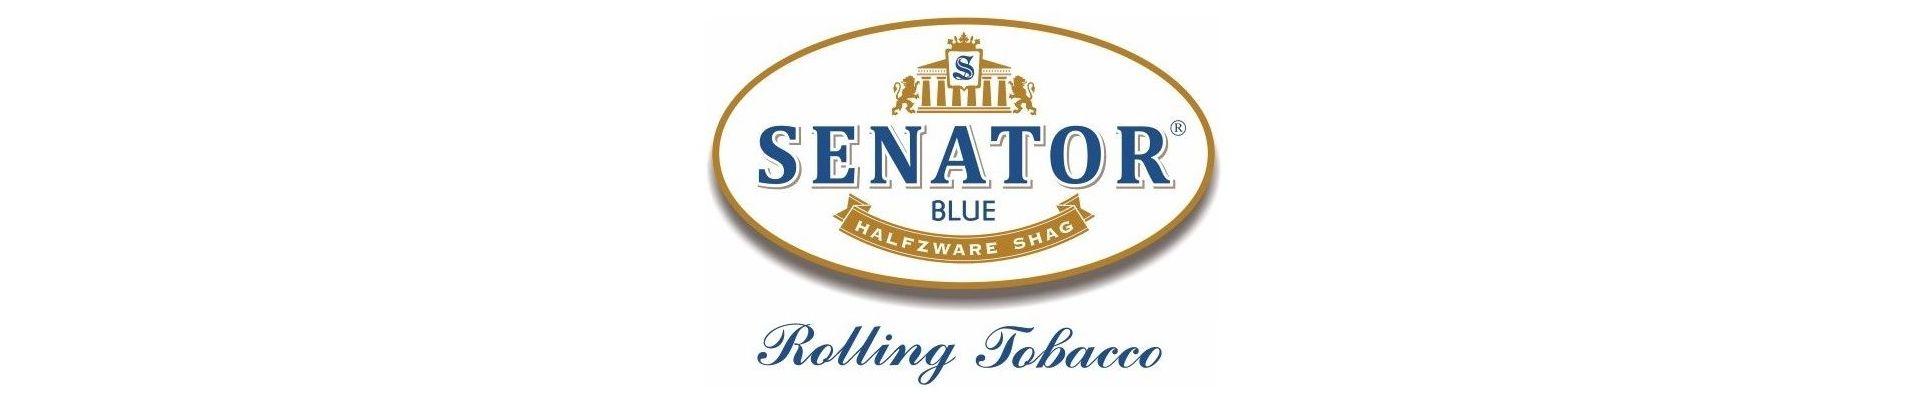 Tutun pentru injectat Senator si tutun pentru tigari Senator.Magazin tutun pentru tigari Senator